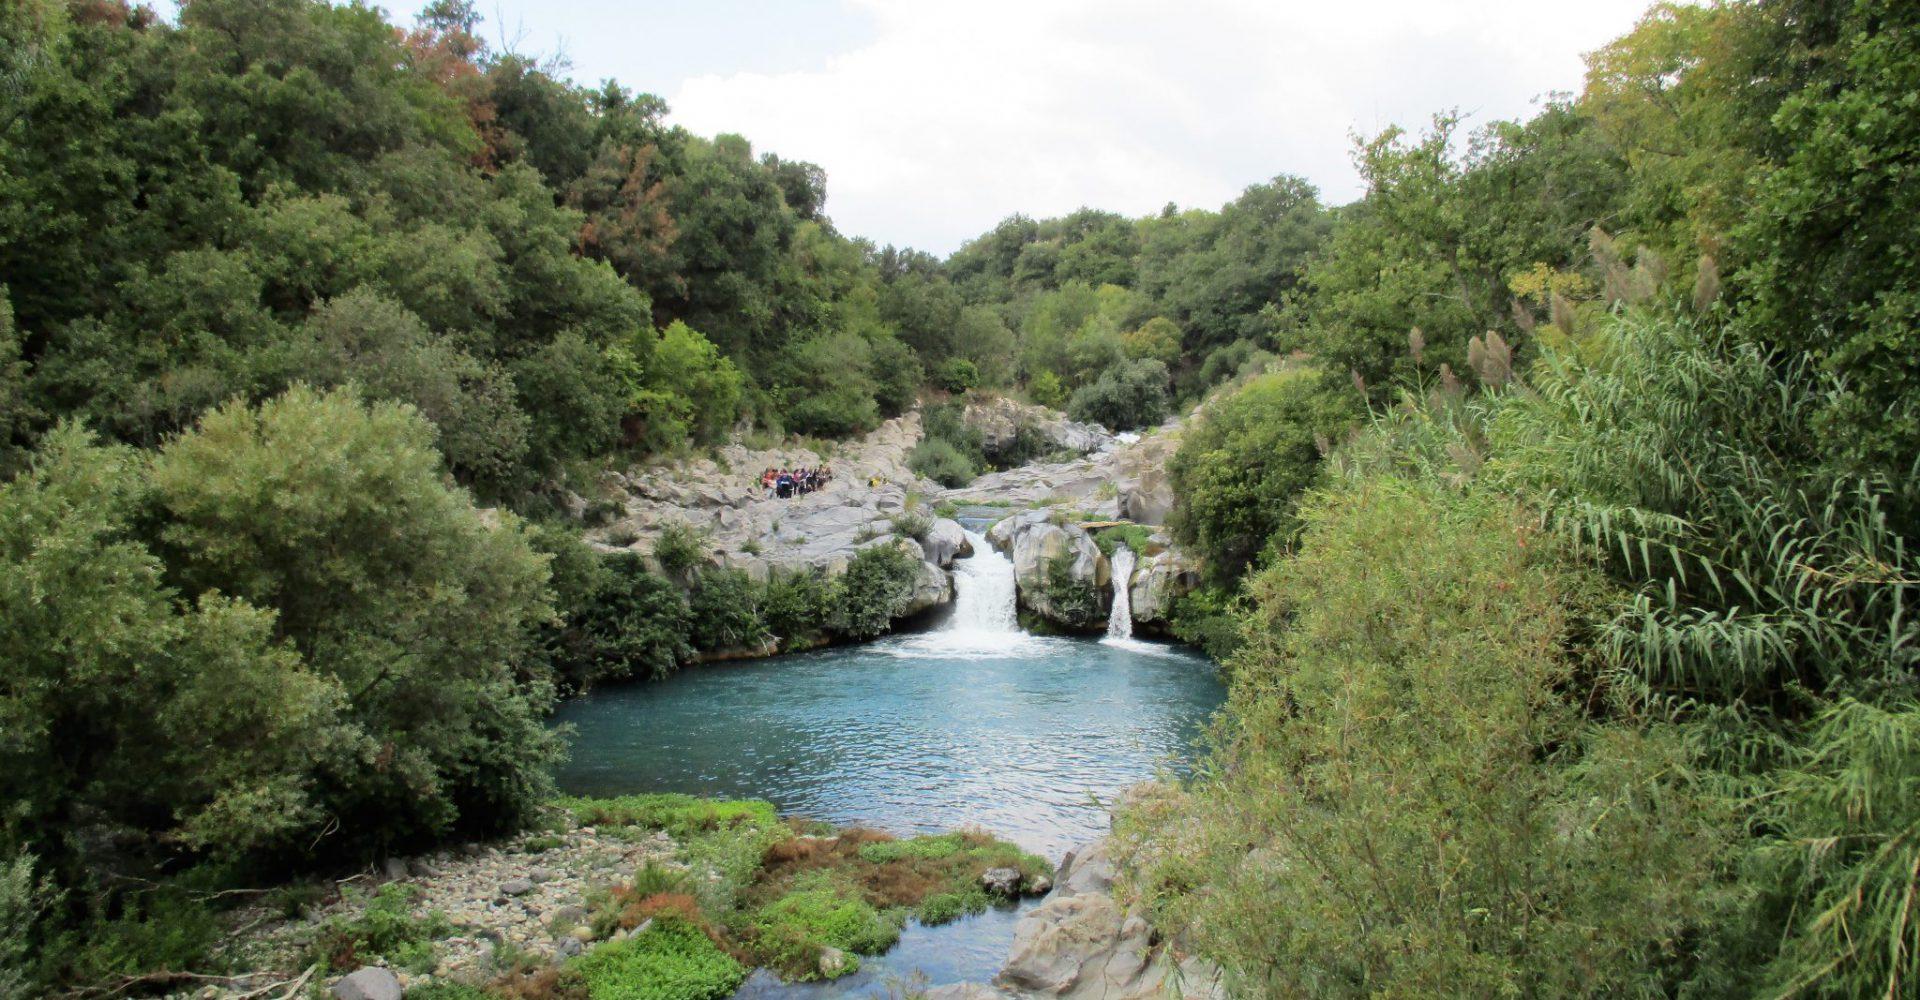 Gurne dell'Alcantara – szlakiem Parku Fluwialnego Rzeki Alcantara